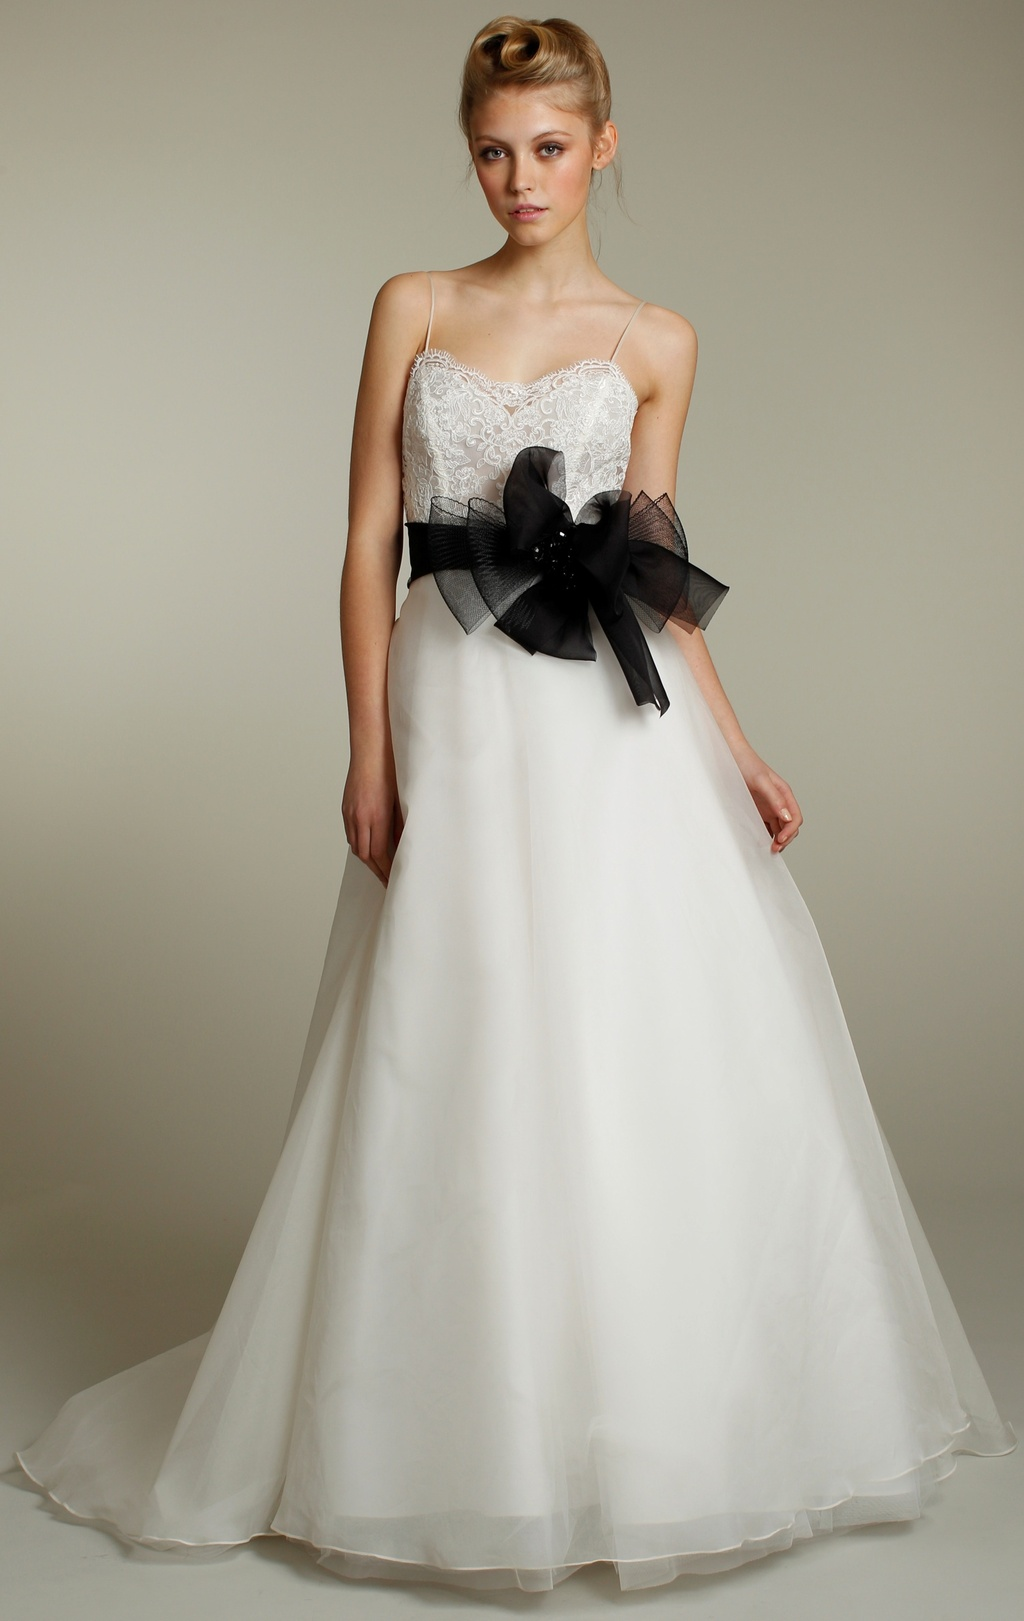 2151-wedding-dress-fall-2011-bridal-gowns-a-line-black-sash.full